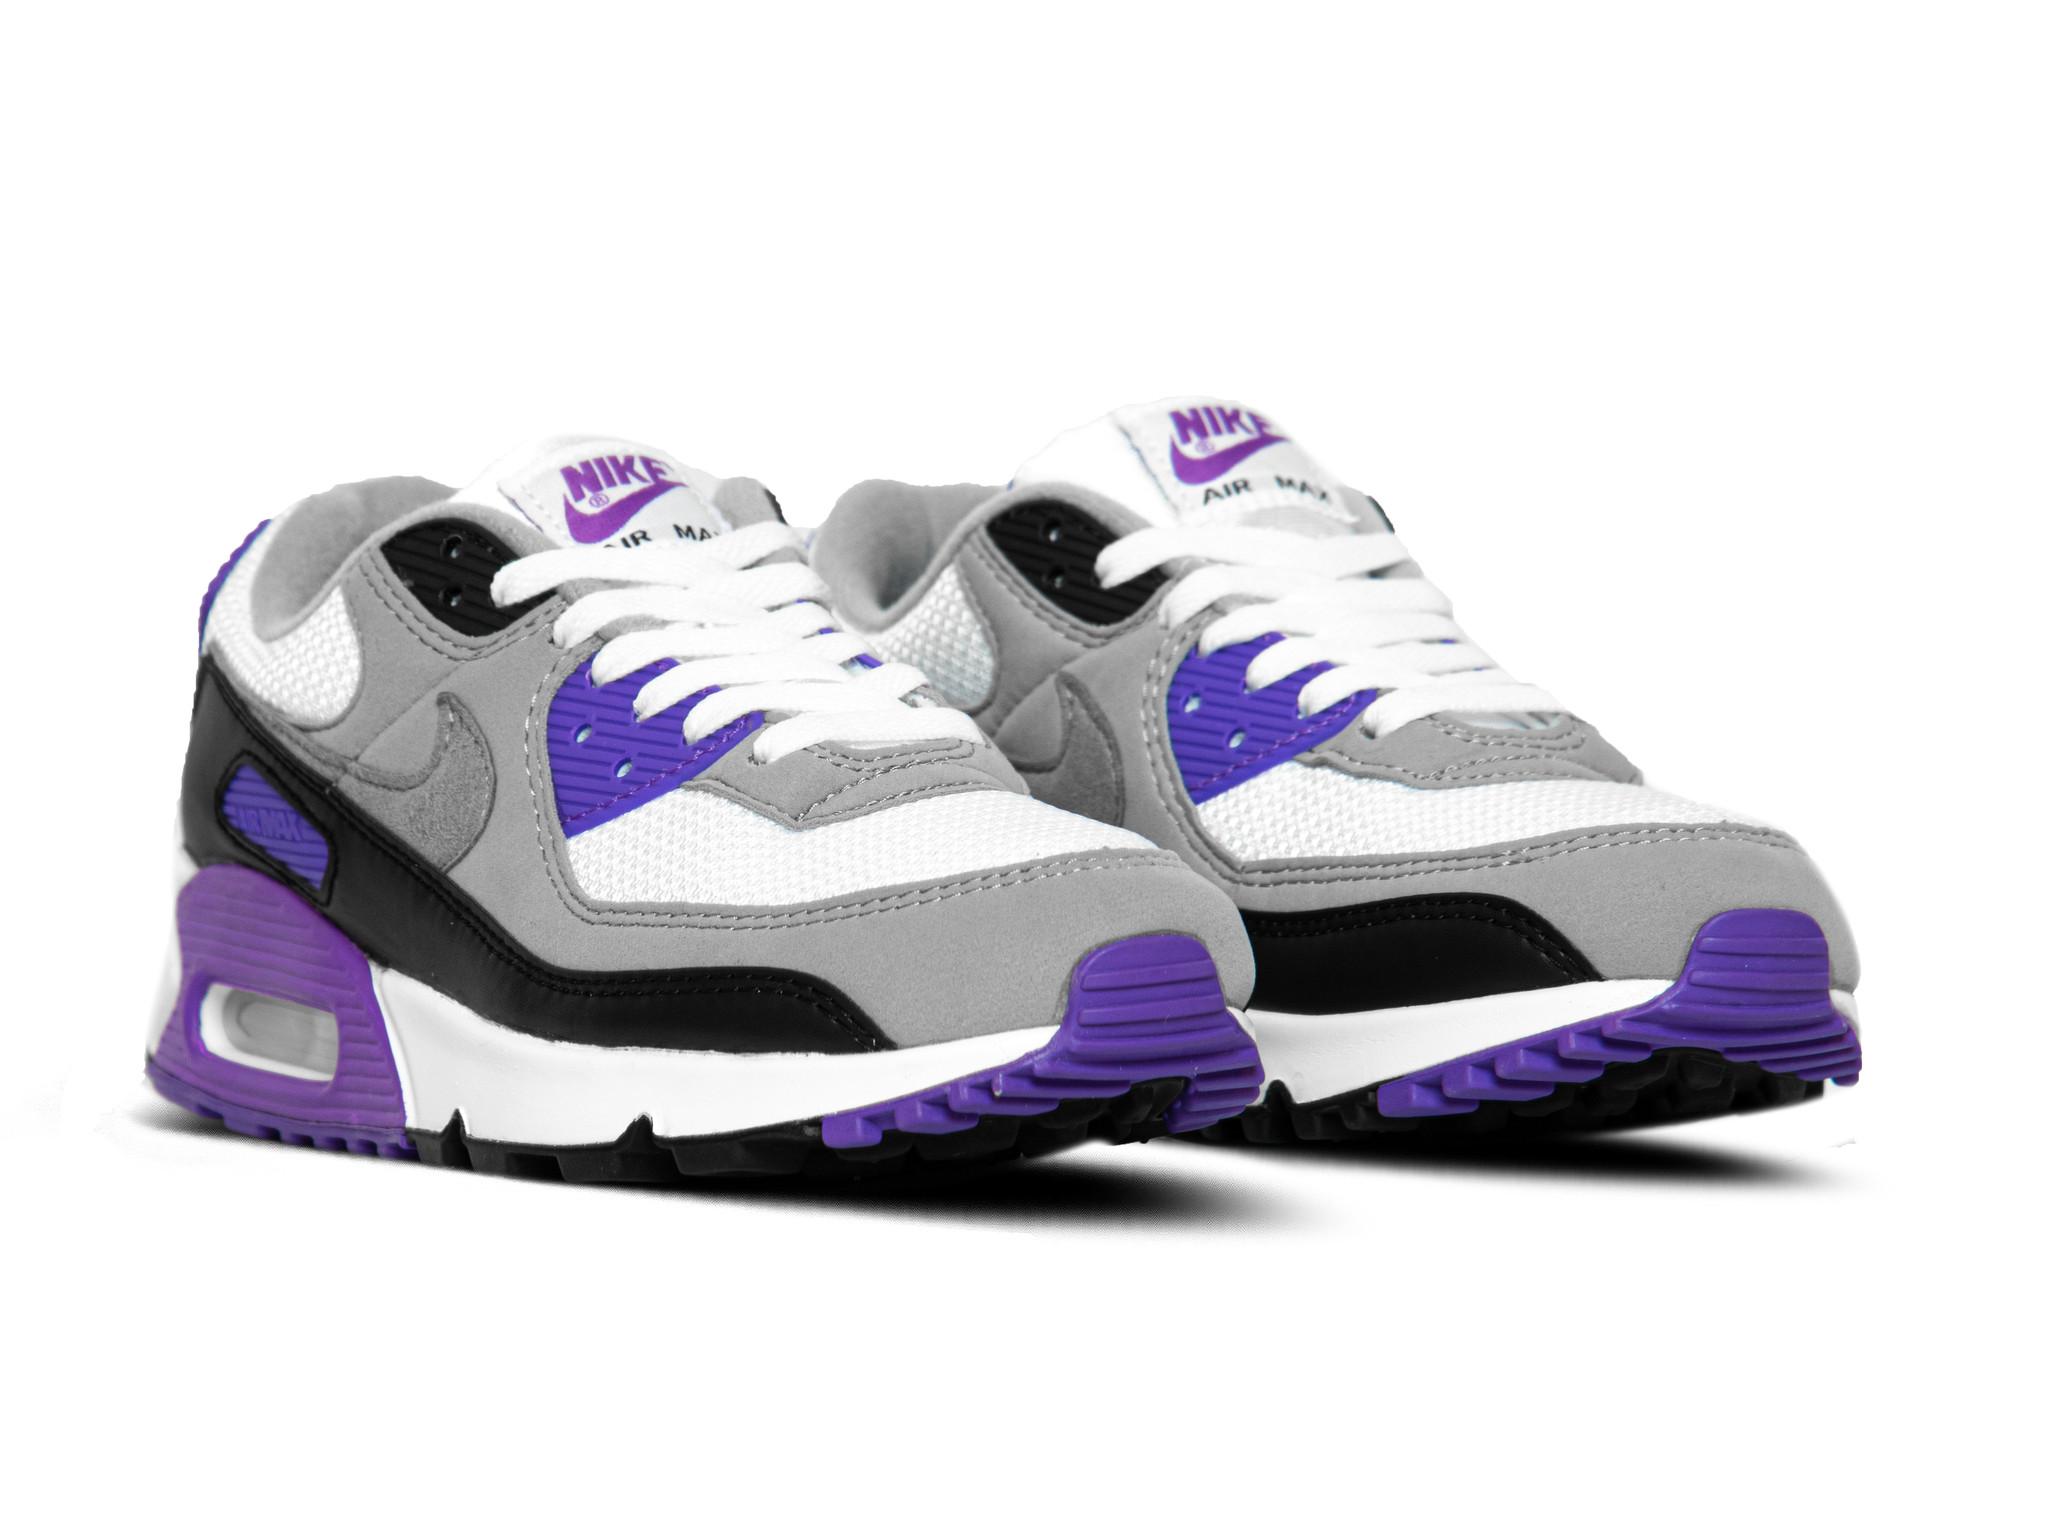 Nike Air Max 90 Particle Grey Hyper Grape CD0881 104